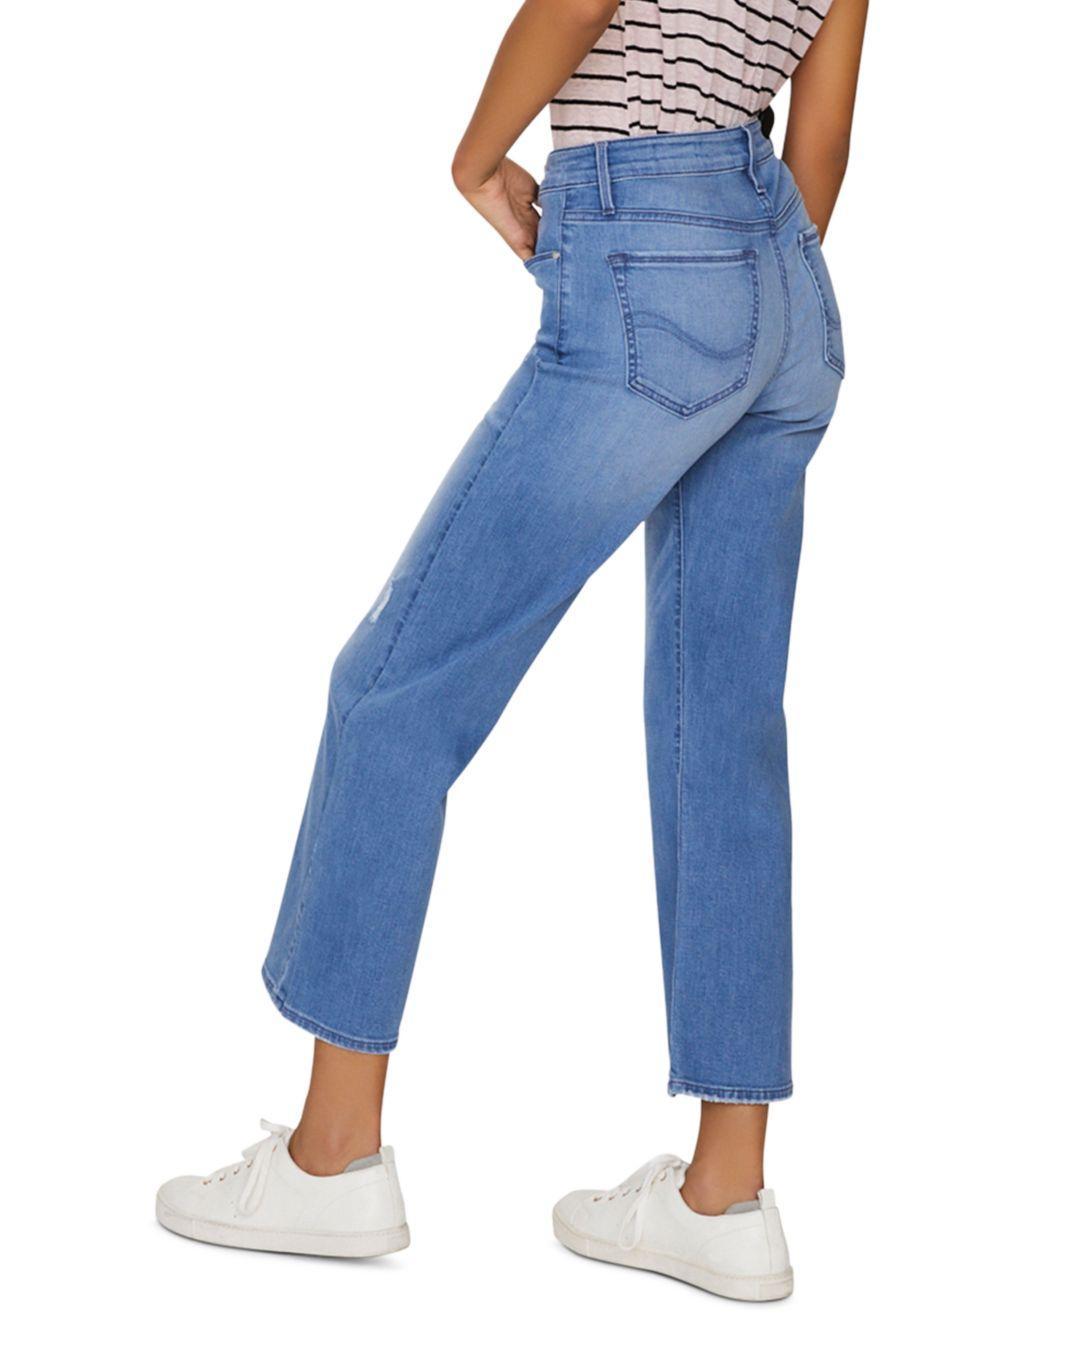 8f8aff41 Sanctuary - Non Conformist Cropped Wide - Leg Jeans In Solano Blue - Lyst.  View fullscreen